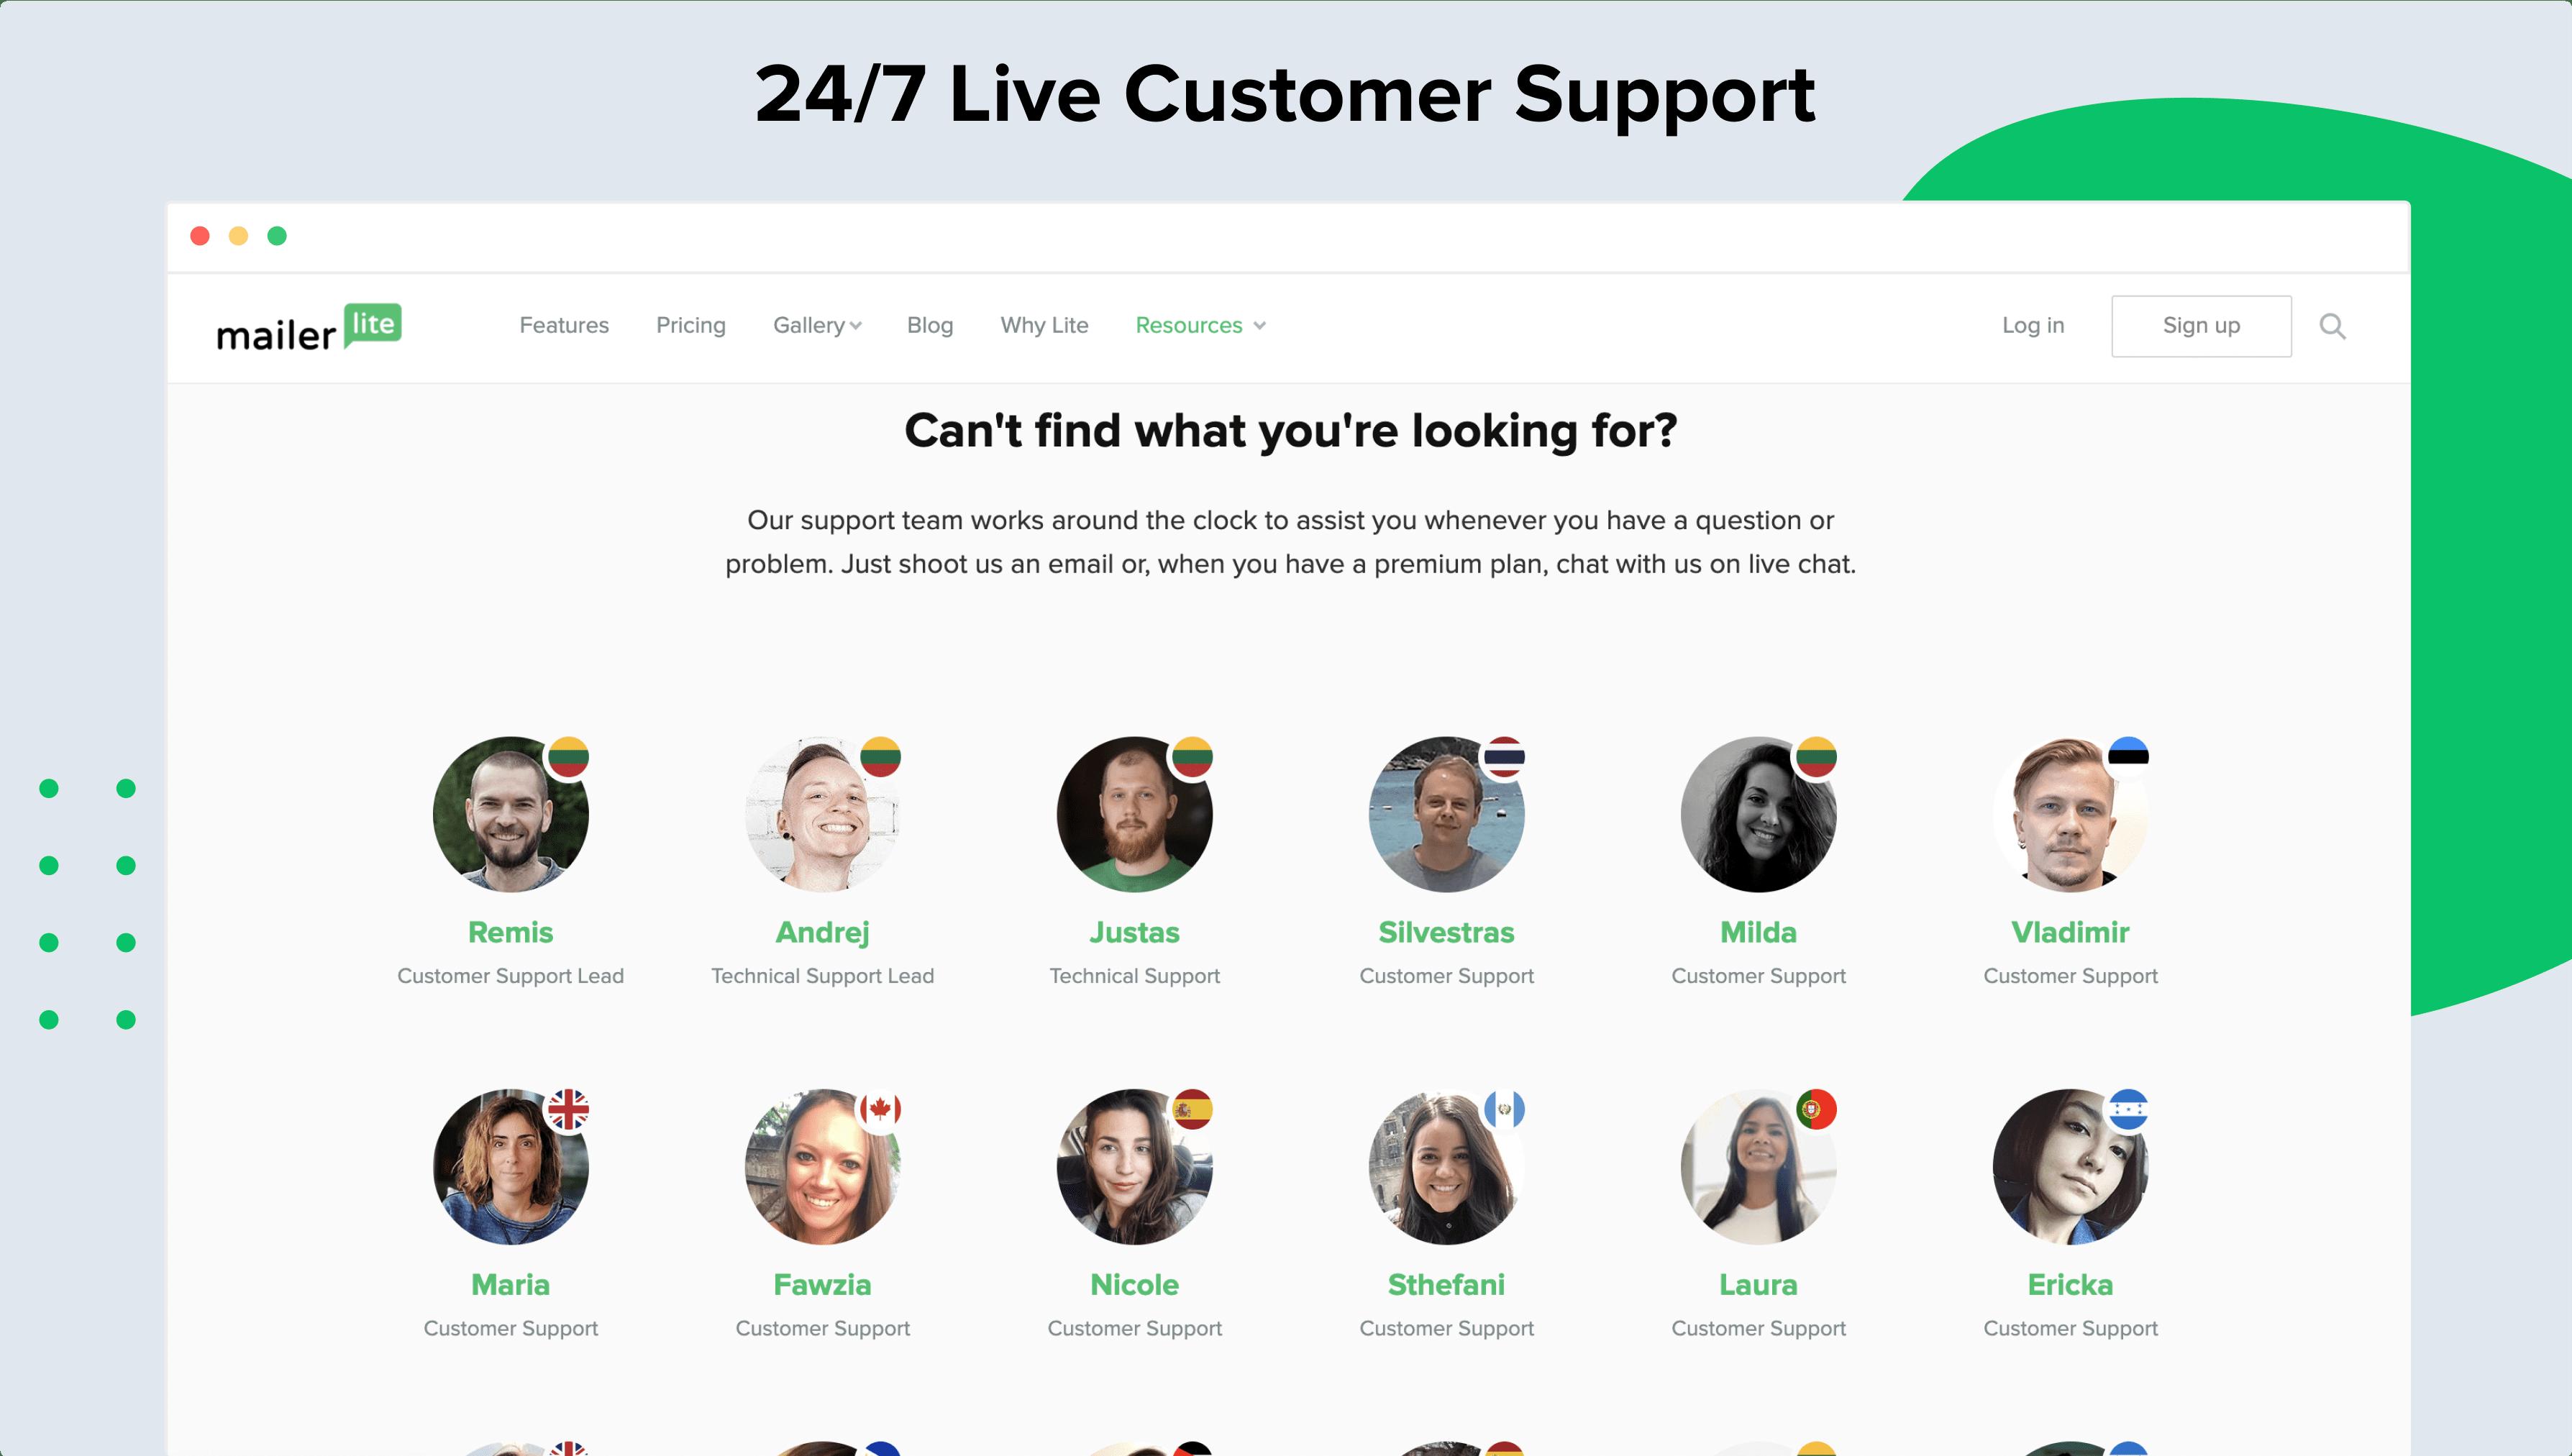 MailerLite Software - 24/7 Live Customer Support